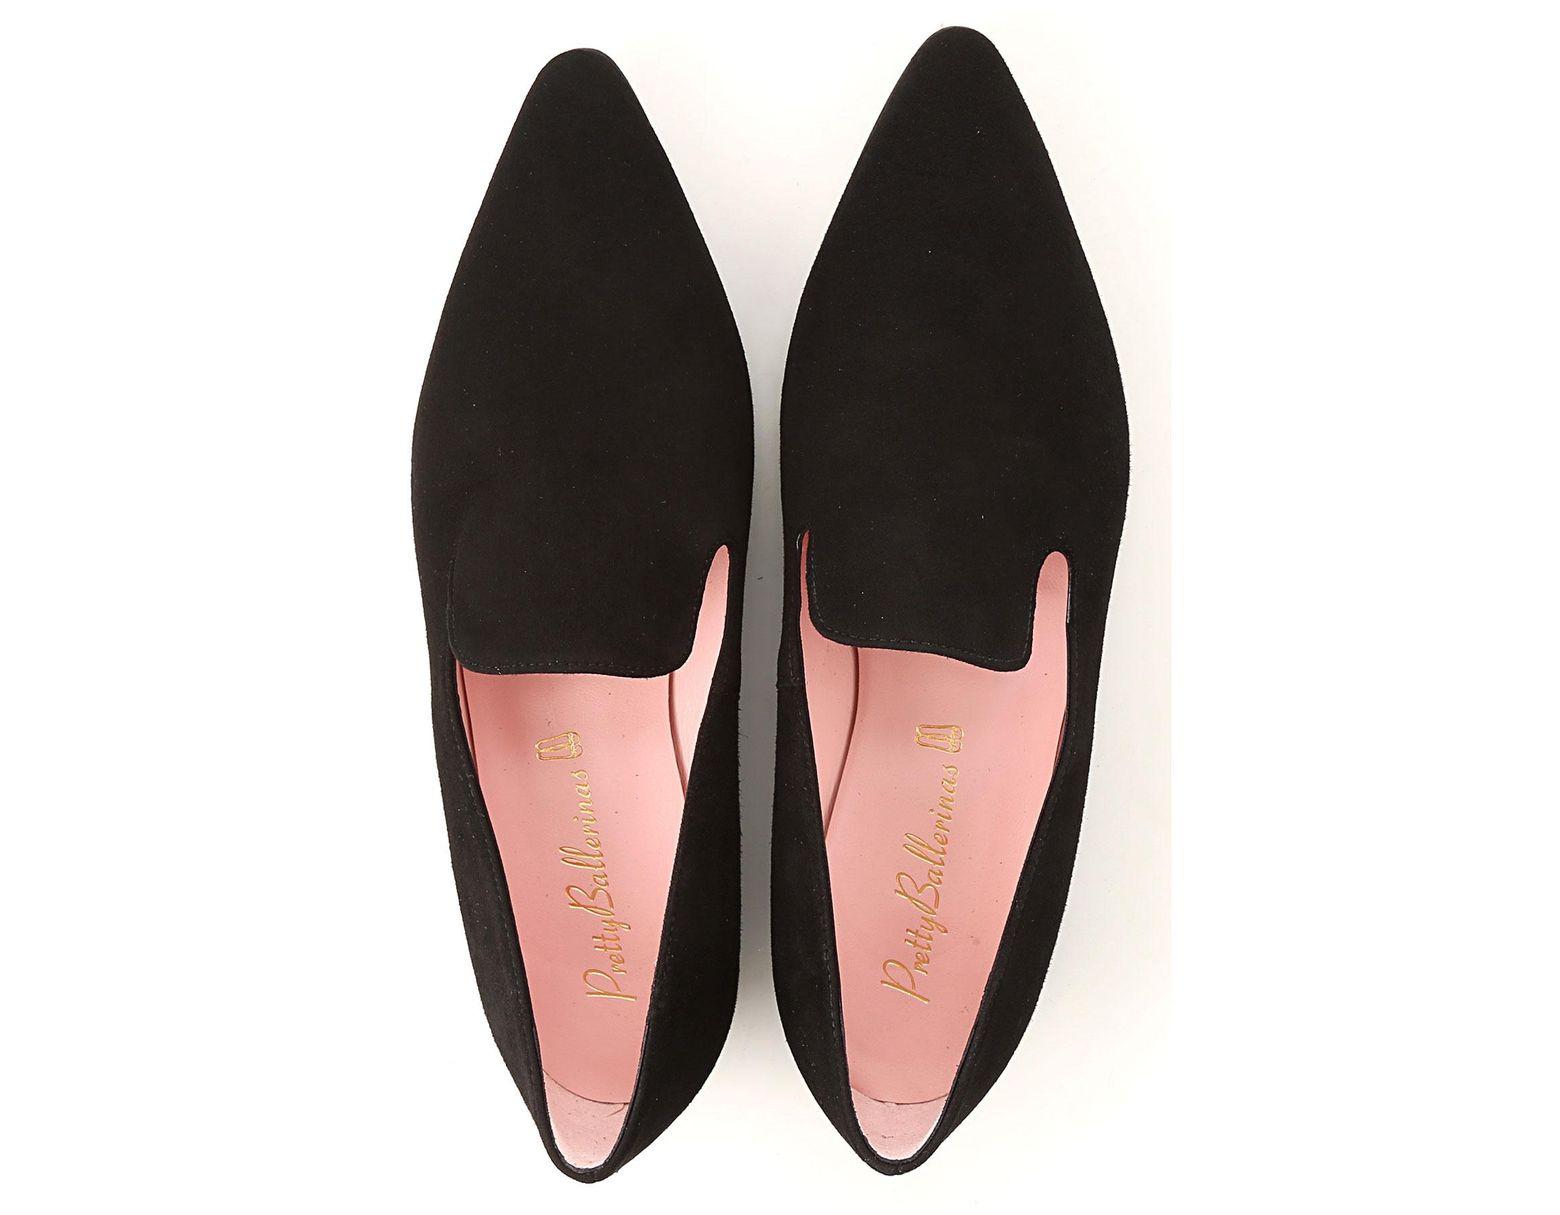 Black Ballet Flats Ballerina Shoes For Women